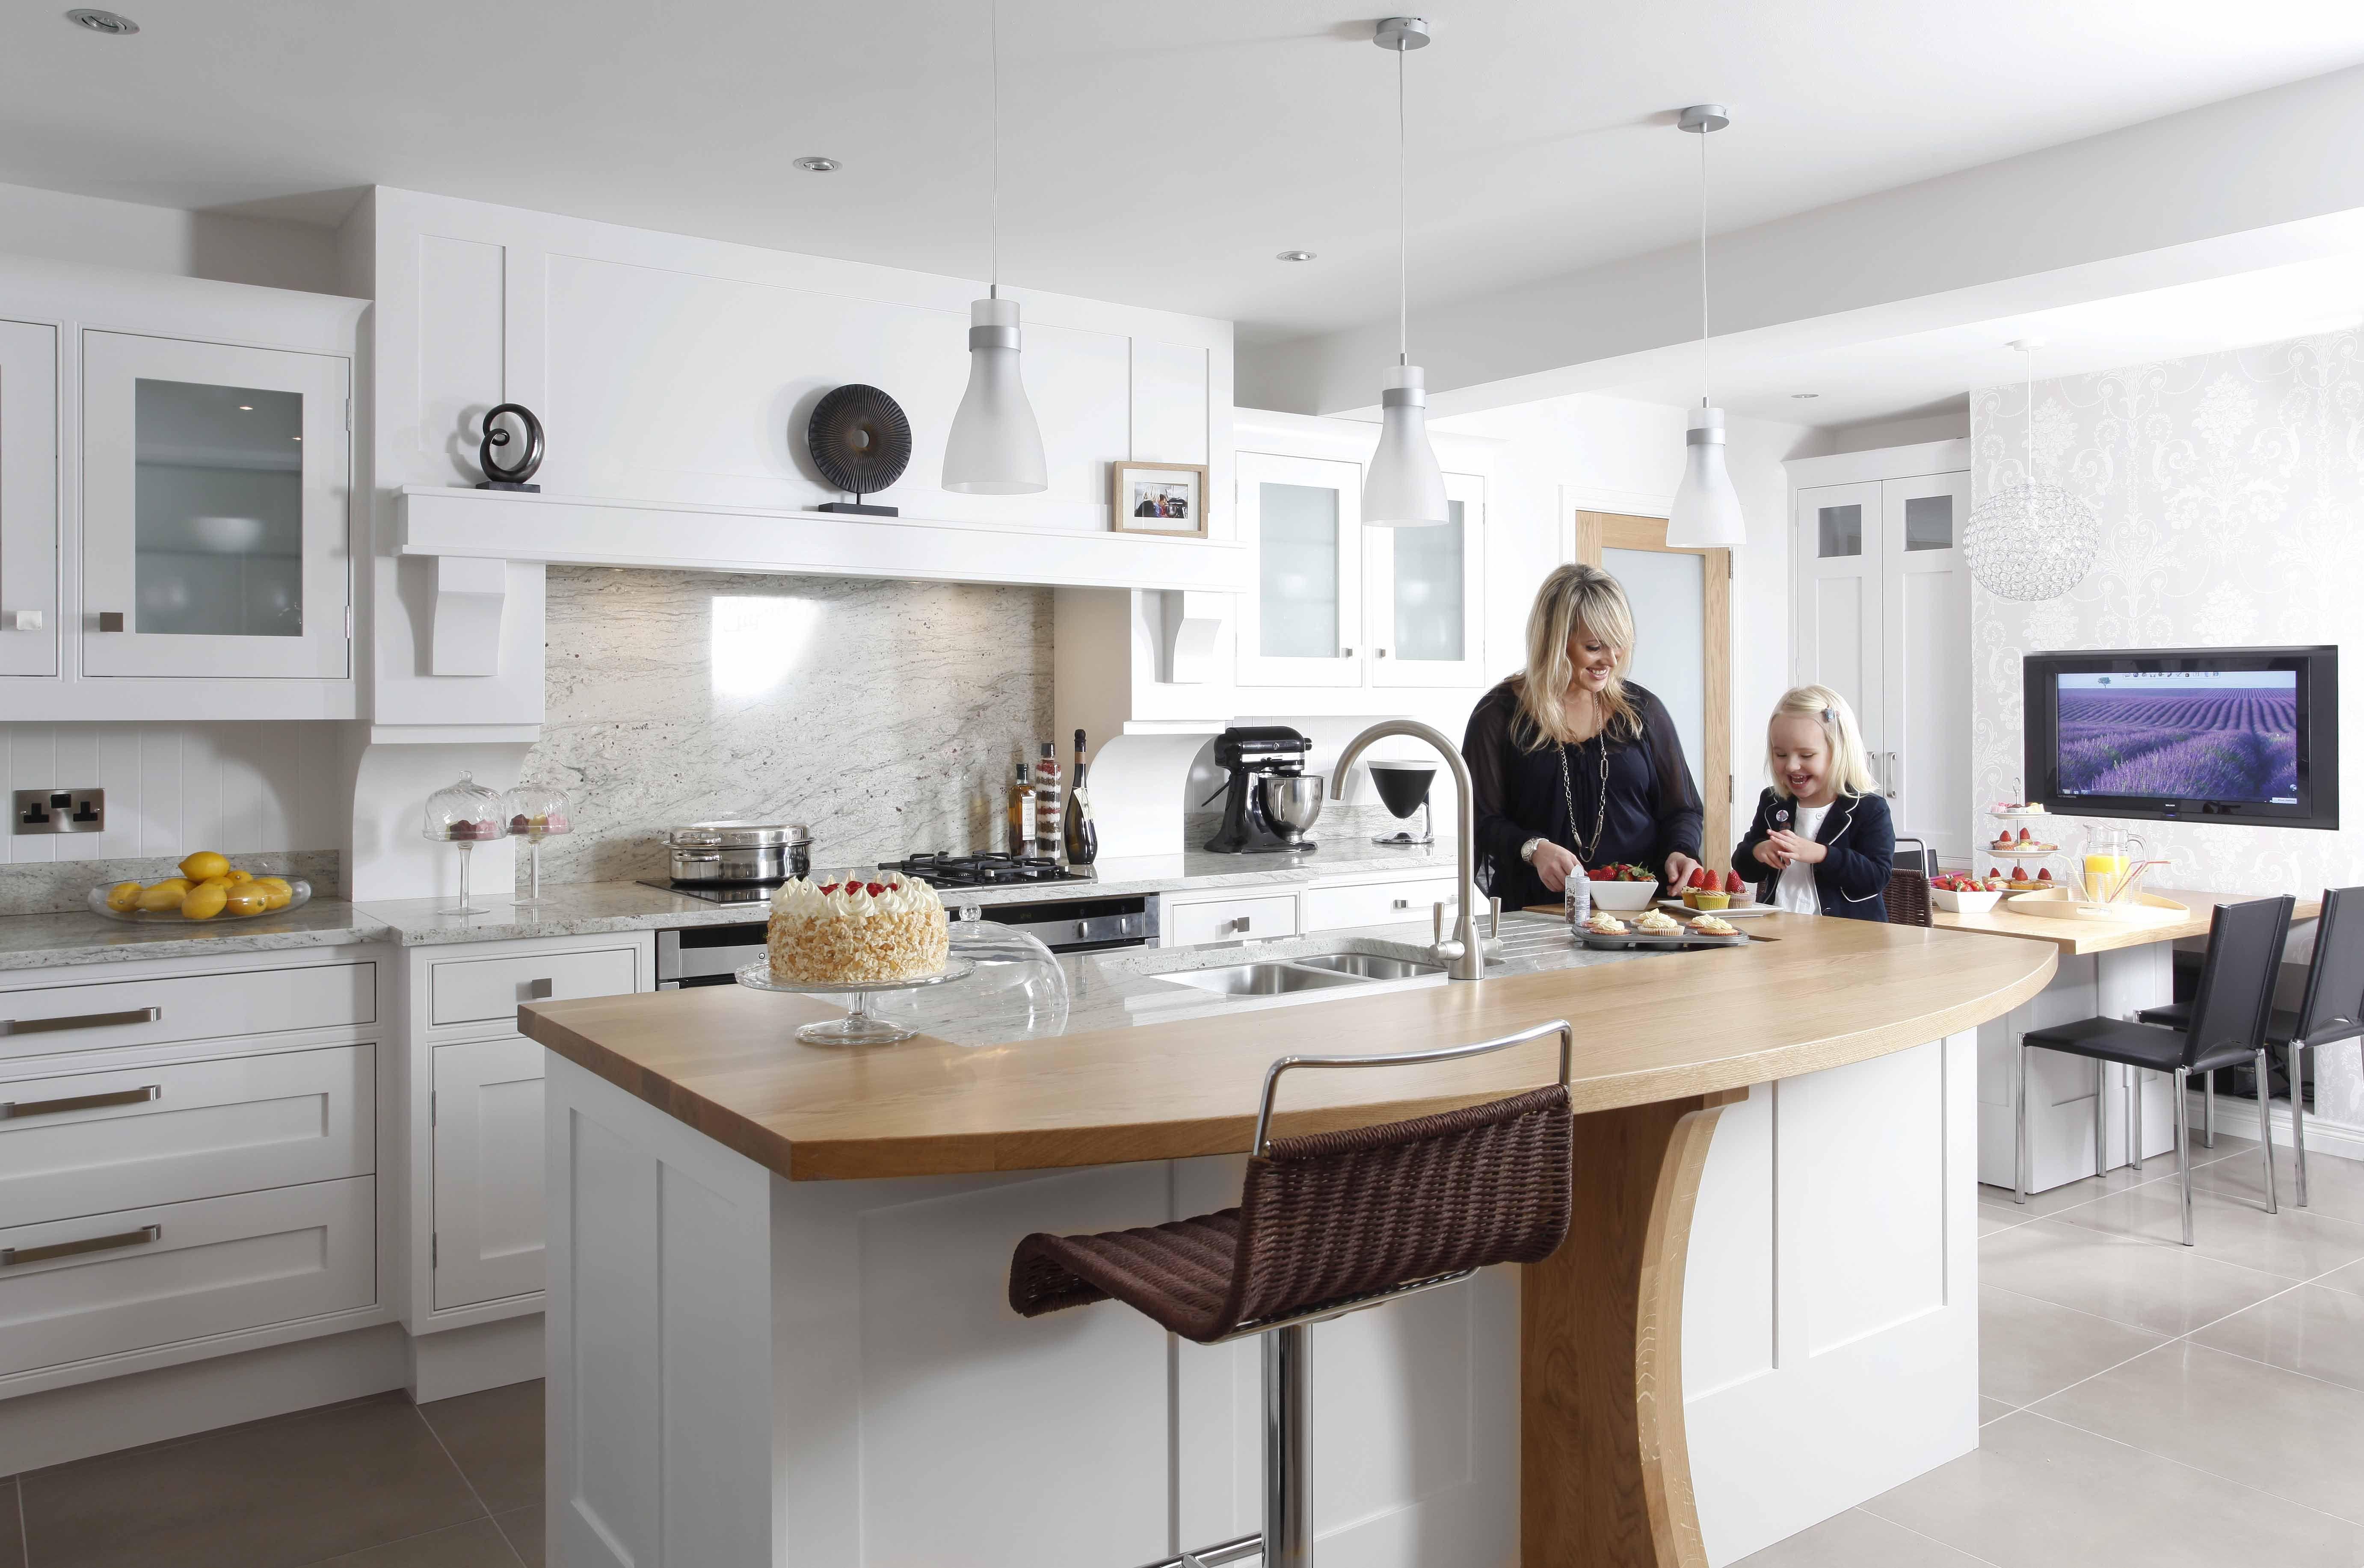 Kitchen Design Ideas Northern Ireland parkes interiors | award winning design studio, bespoke designer